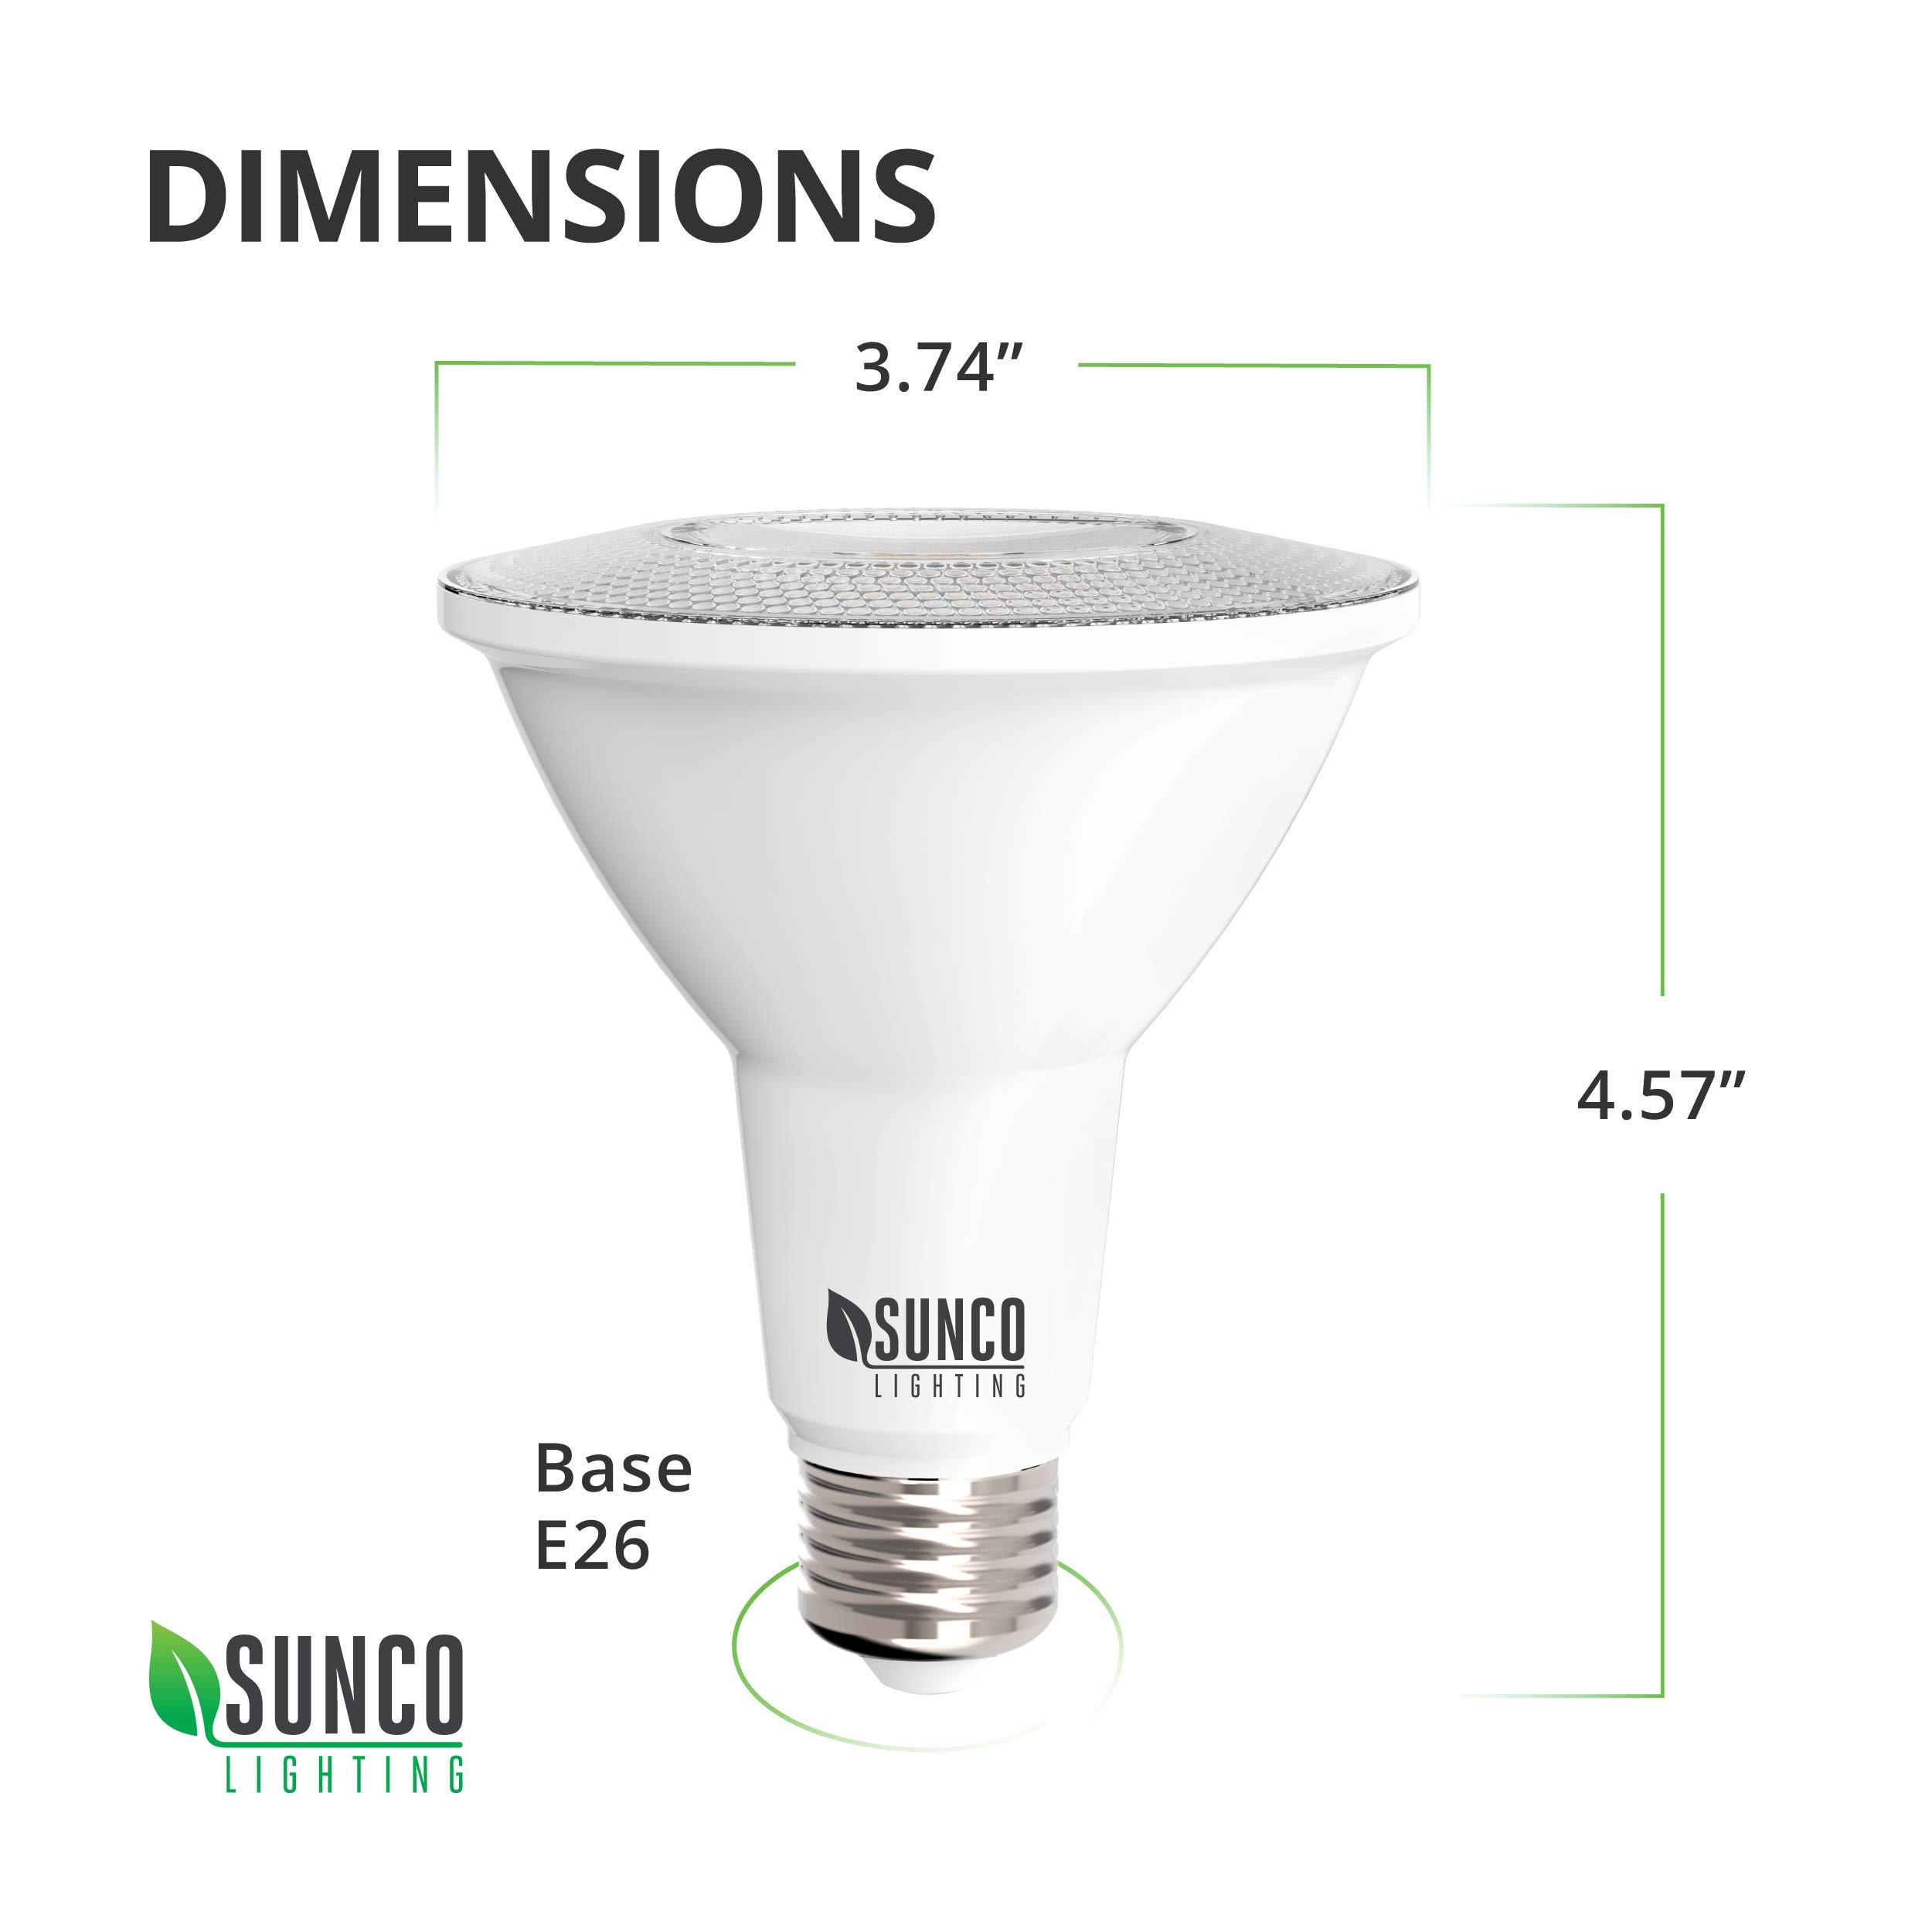 Sunco Lighting 4 Pack PAR30 LED Bulb, Dusk-to-Dawn Photocell Sensor, 11W=75W, 5000K Daylight, 850 LM, Auto On/Off Security Flood Light - UL by Sunco Lighting (Image #8)